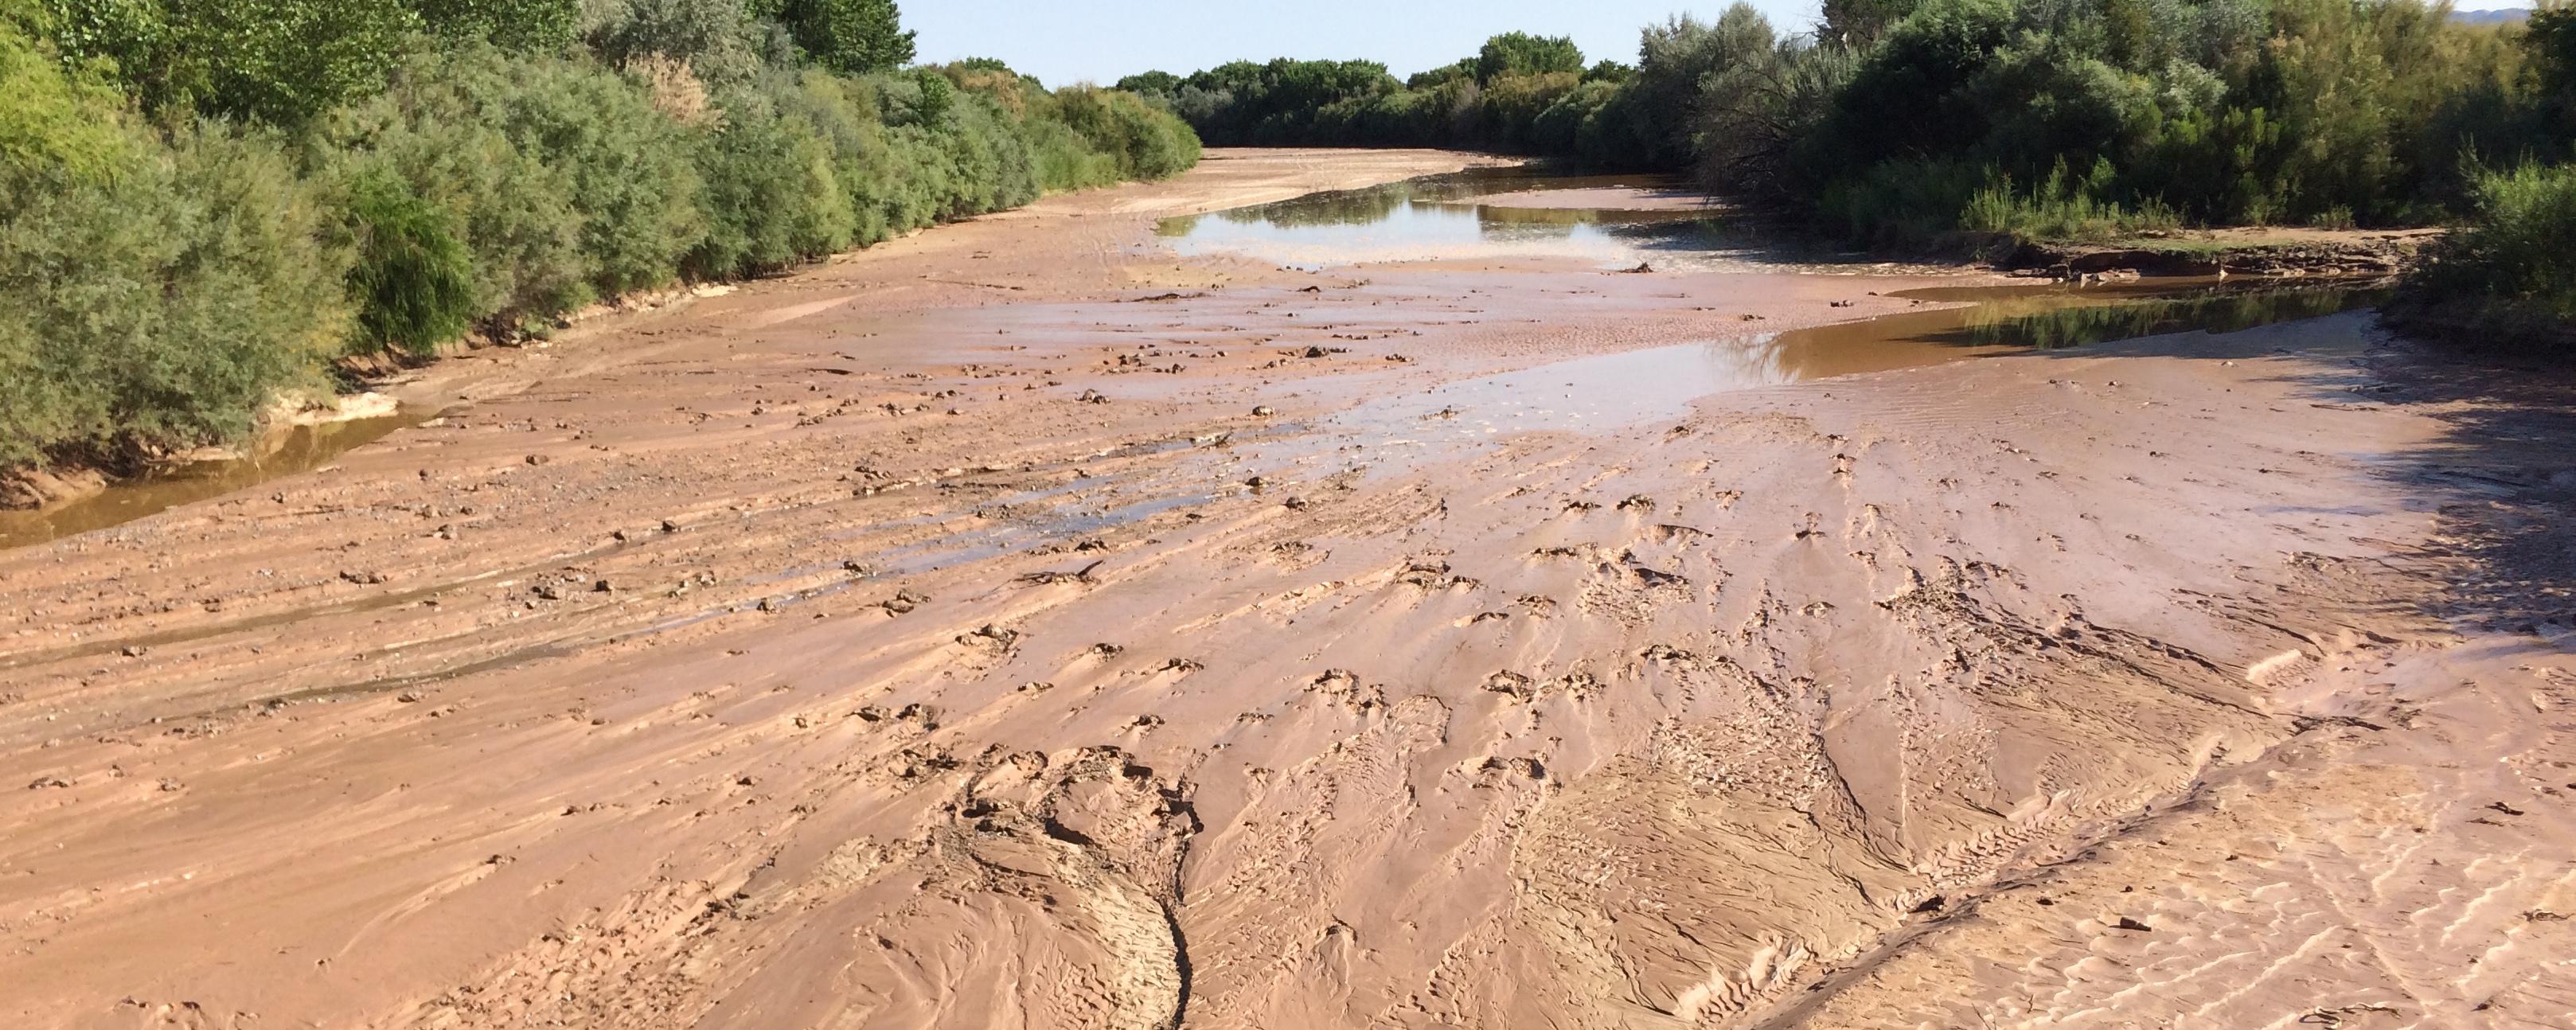 The Middle Rio Grande was dry near San Antonio in July.